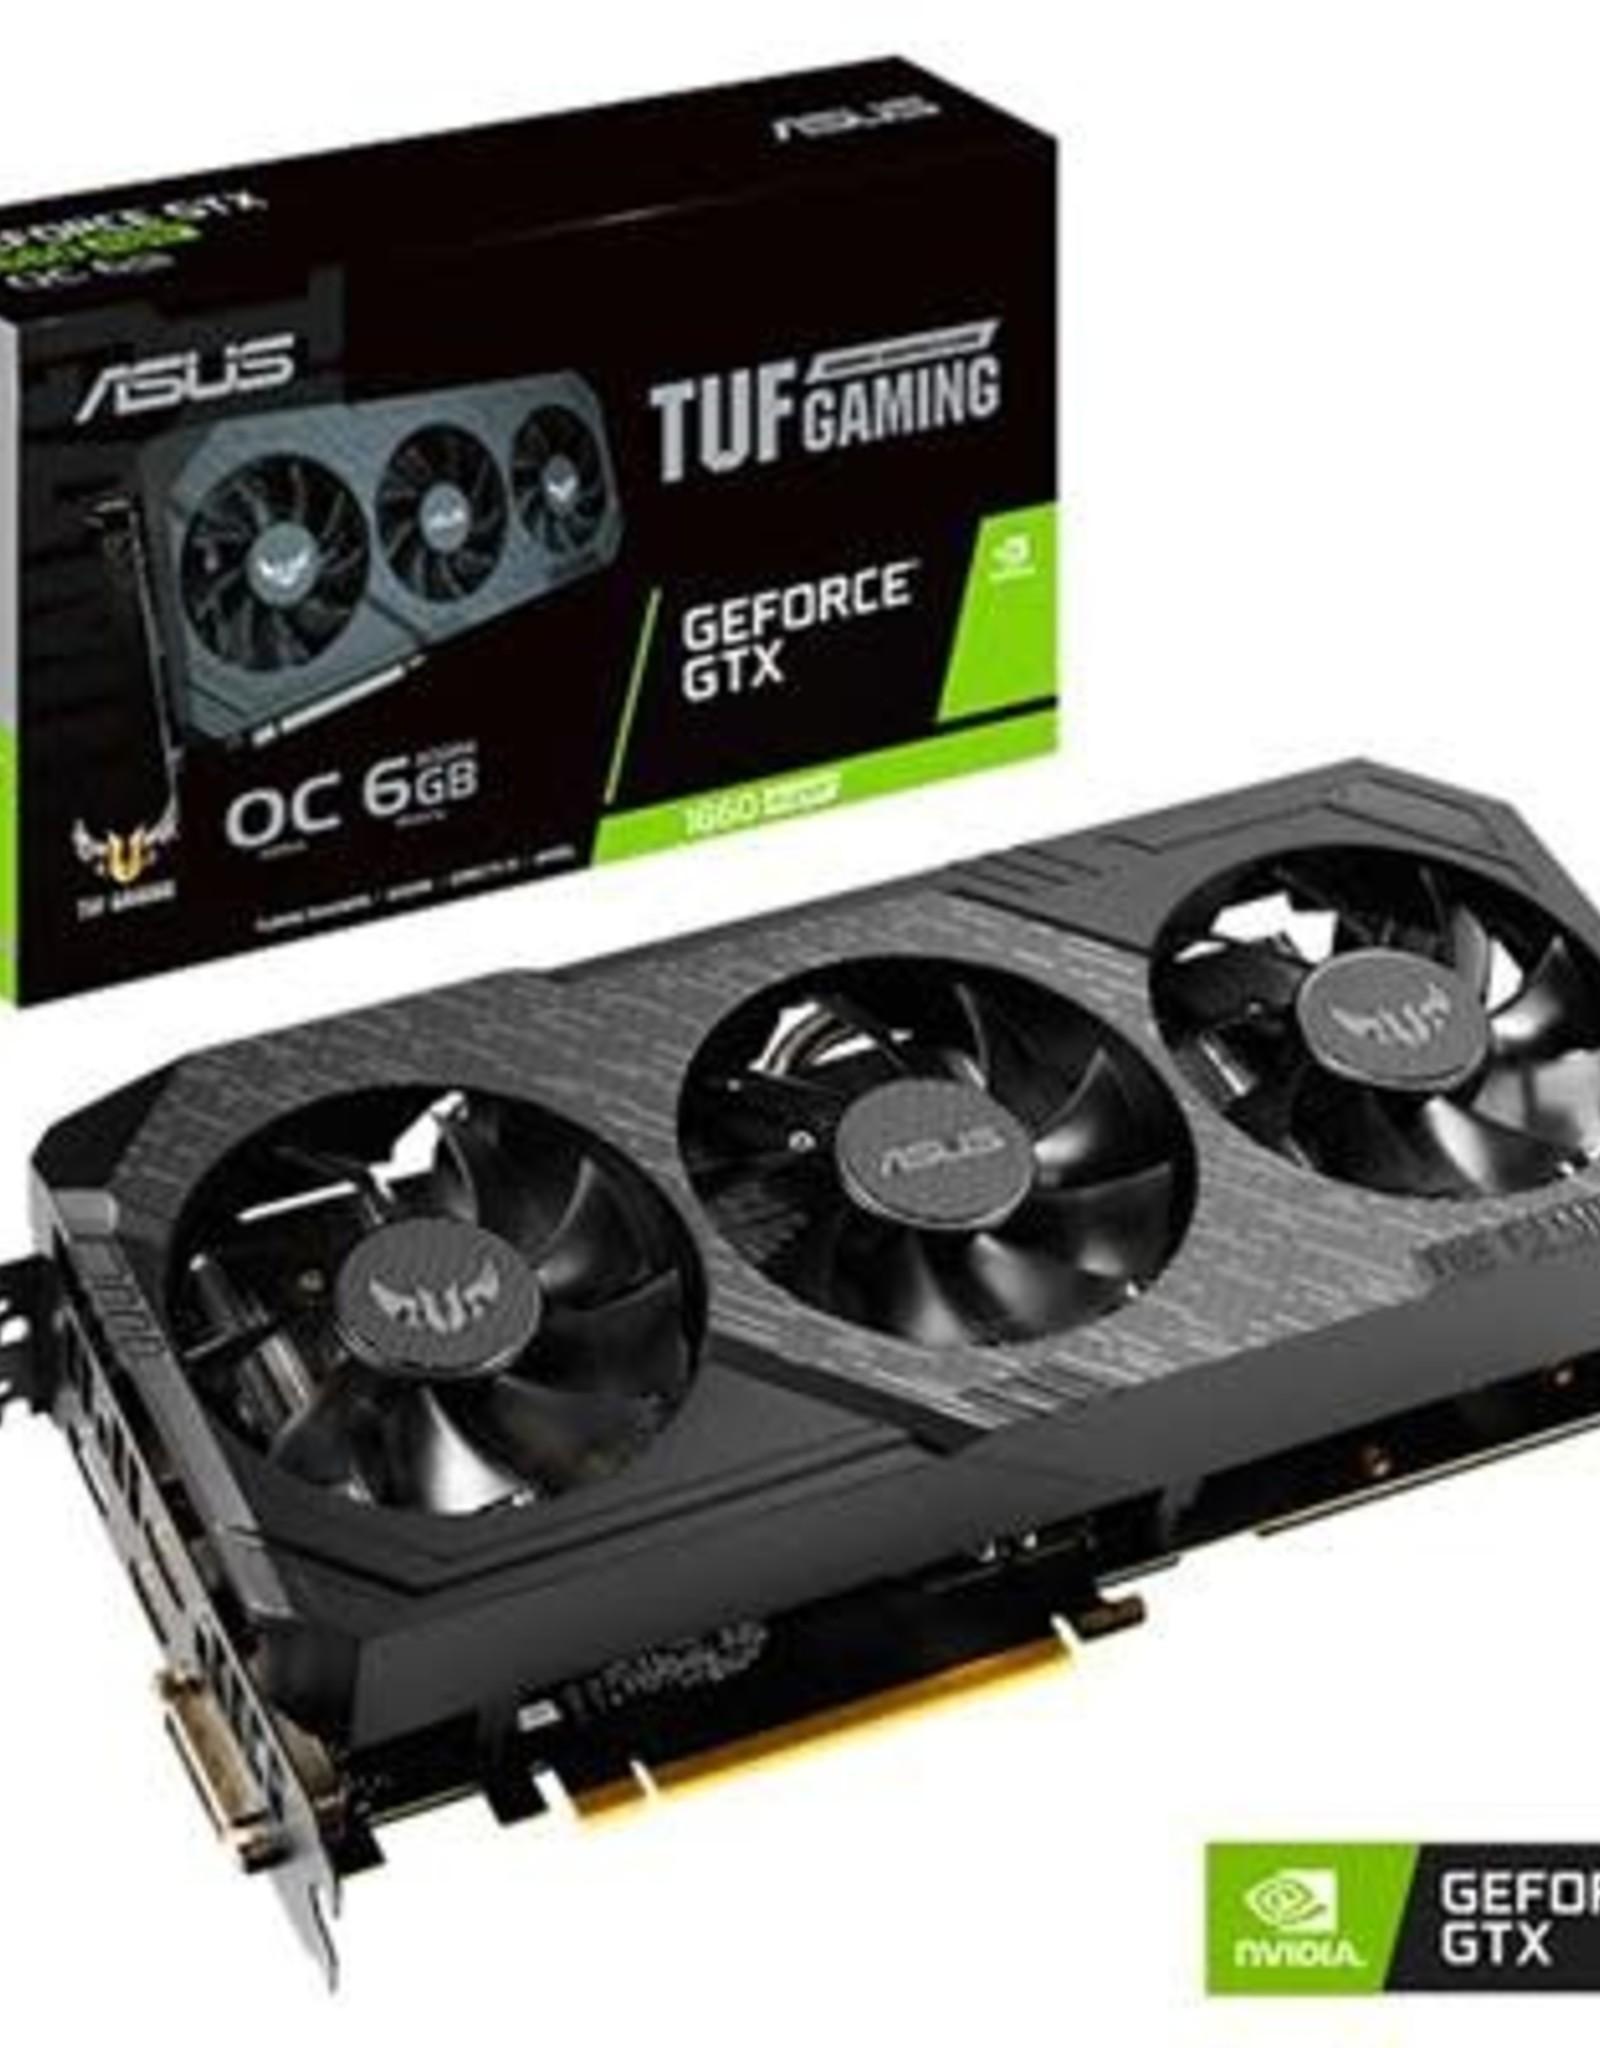 Asus ASUS | VCX TUF 3-GTX1660S-O6G-GAMING GeForce GTX 1660 SUPER GDDR6 6GB 192B HDMI